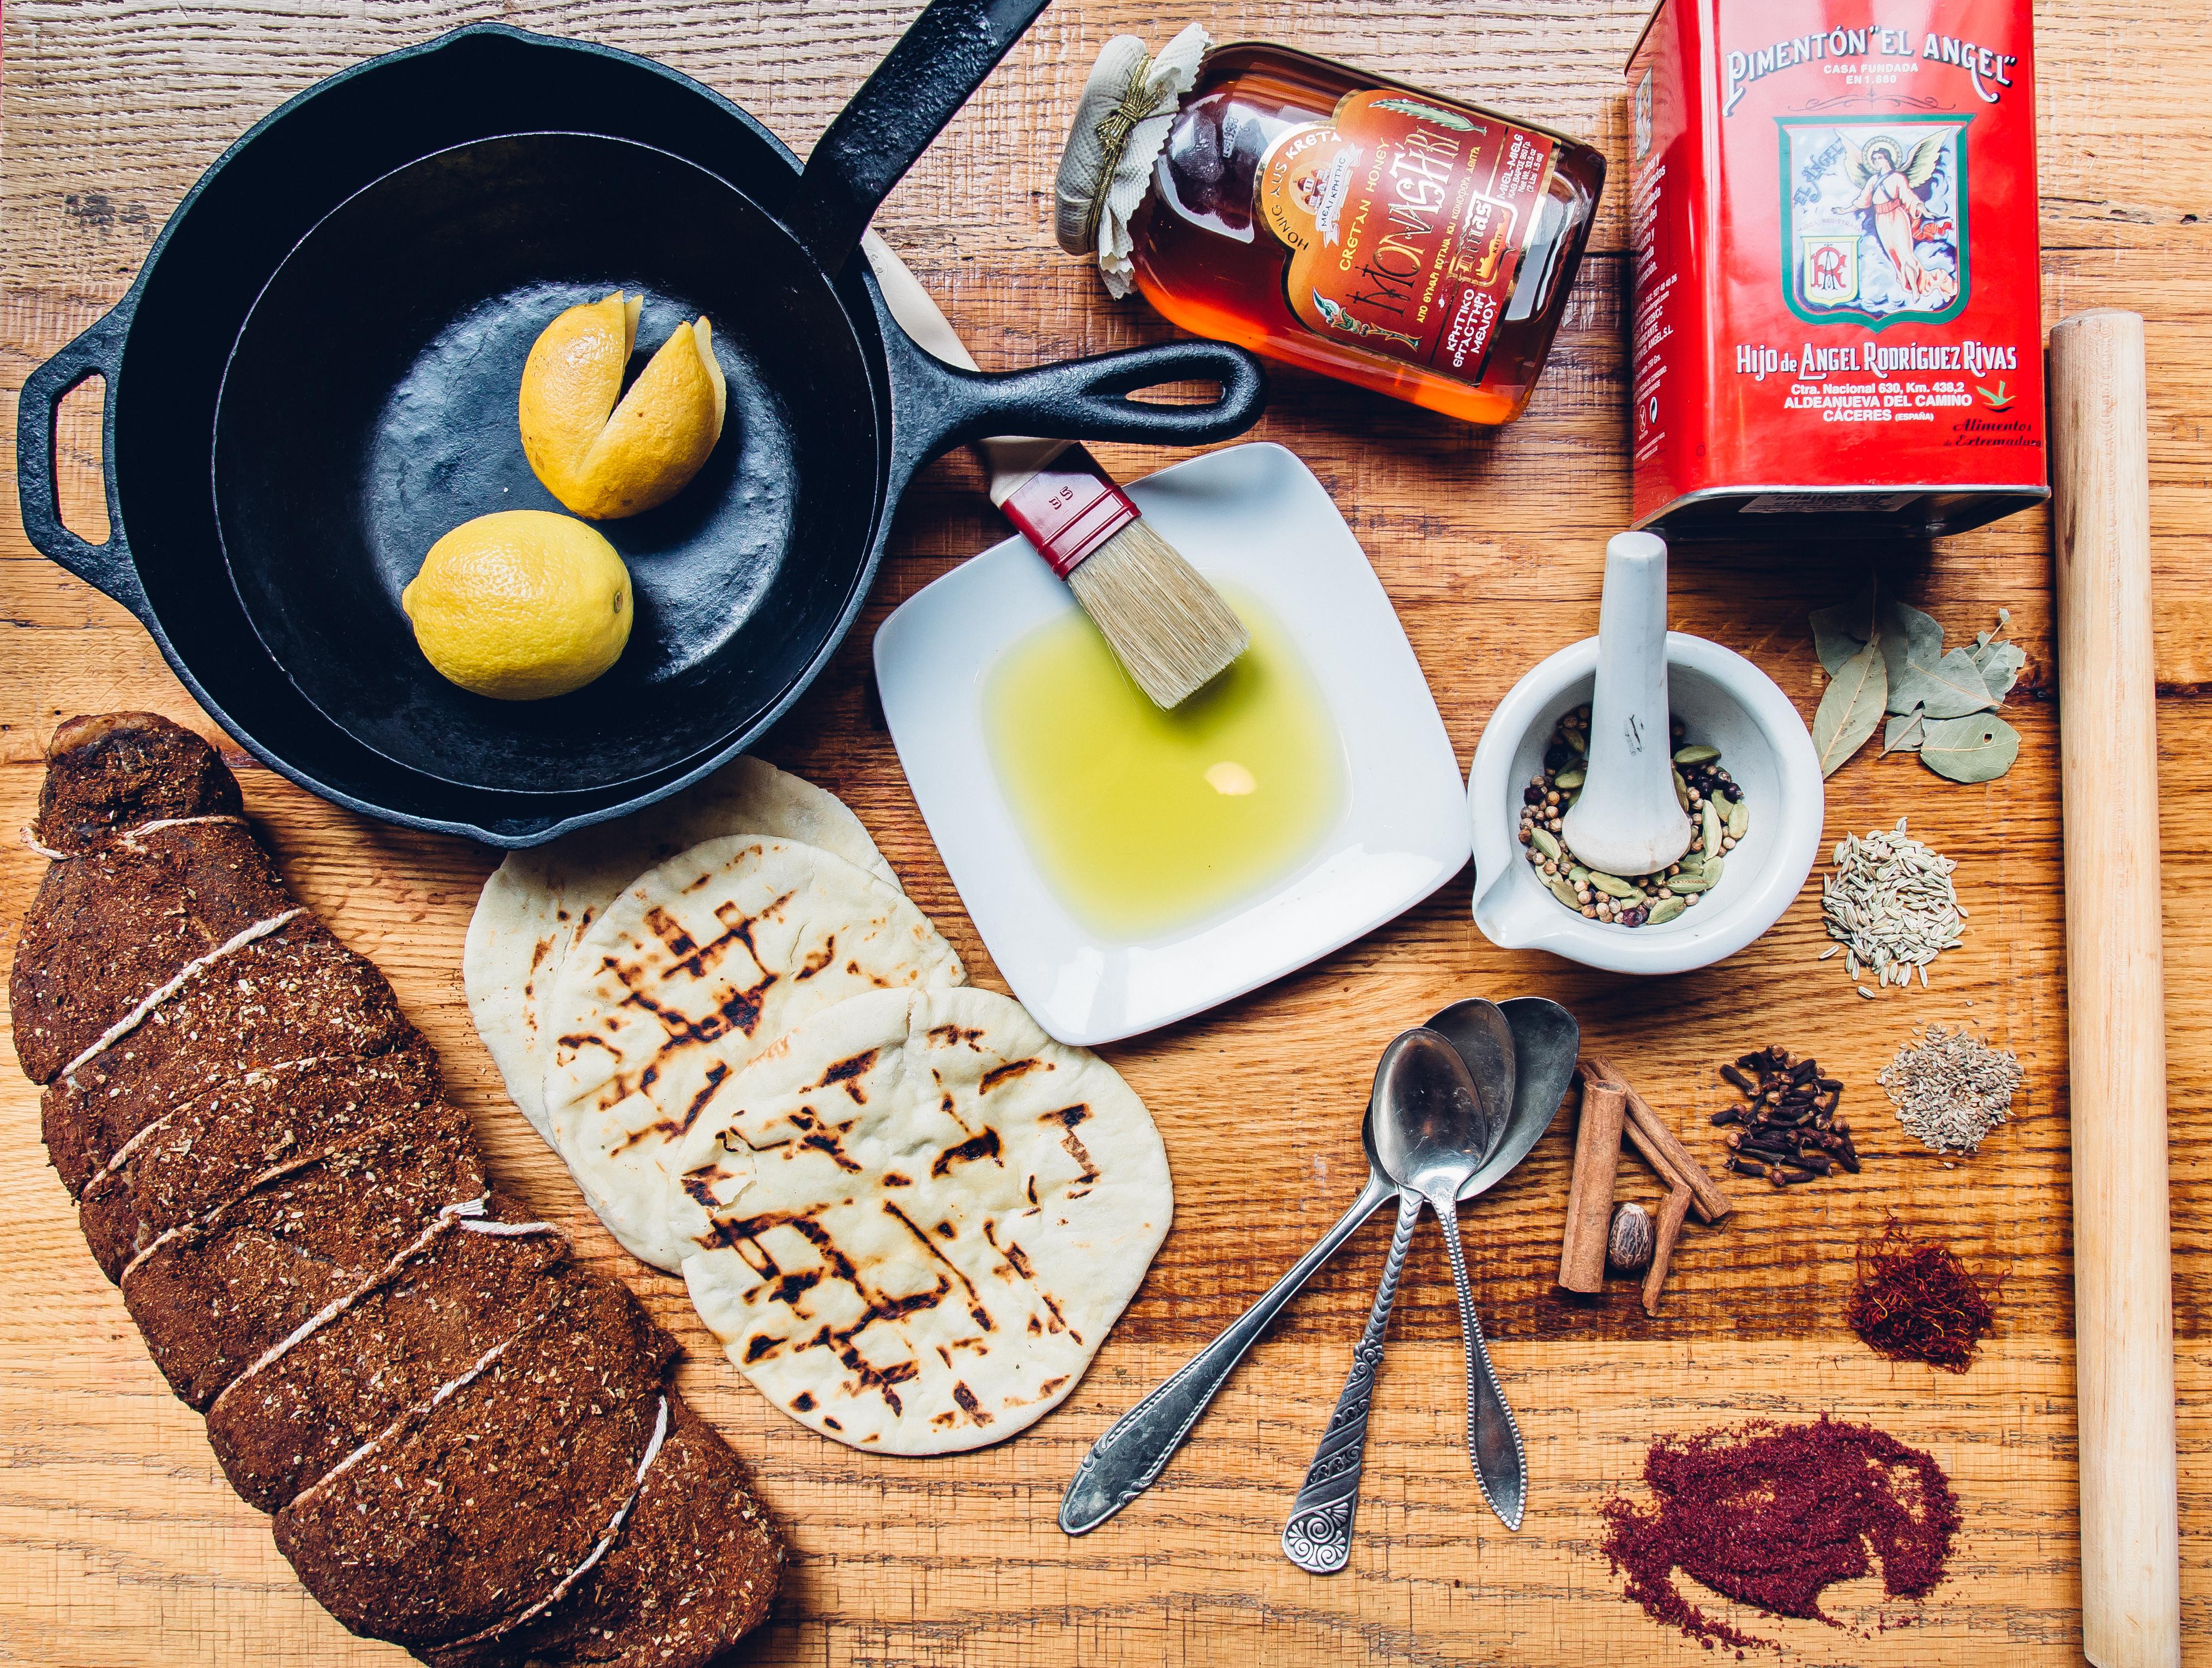 Bobby Saritsoglou's Chef Reveal